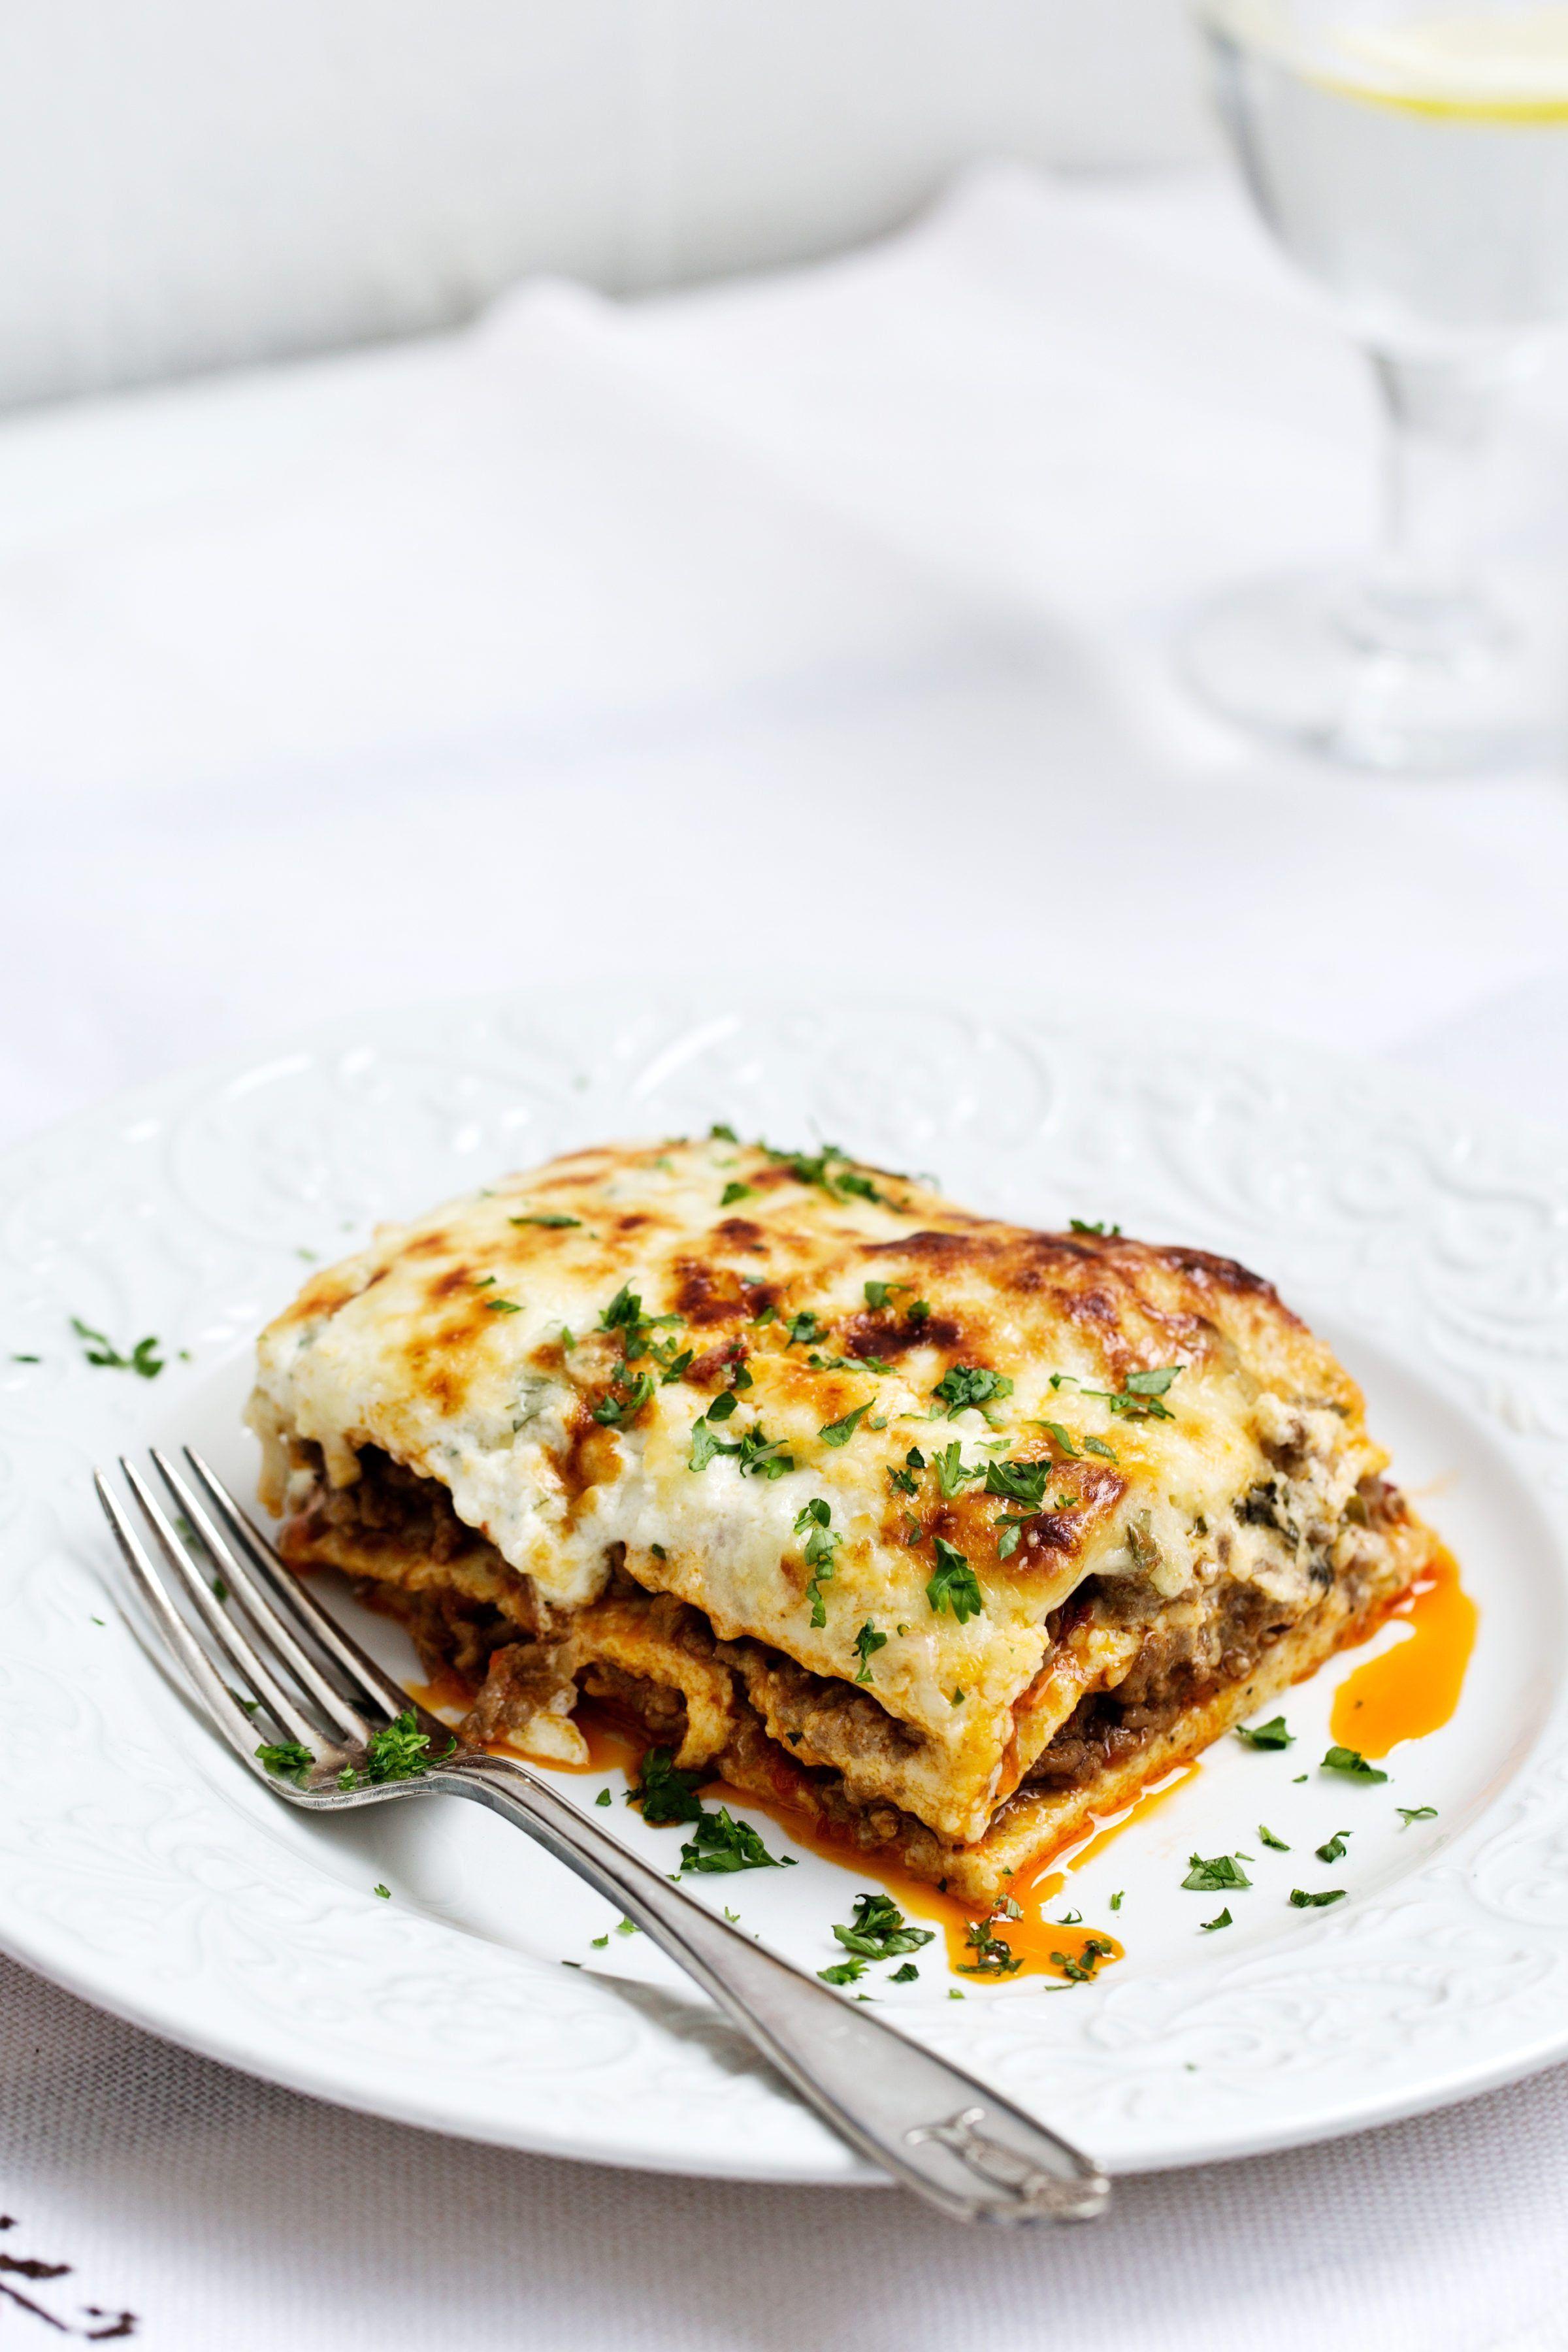 The Best Keto Lasagna Delicious Recipe Diet Doctor Recipe Keto Lasagna Recipes Meals